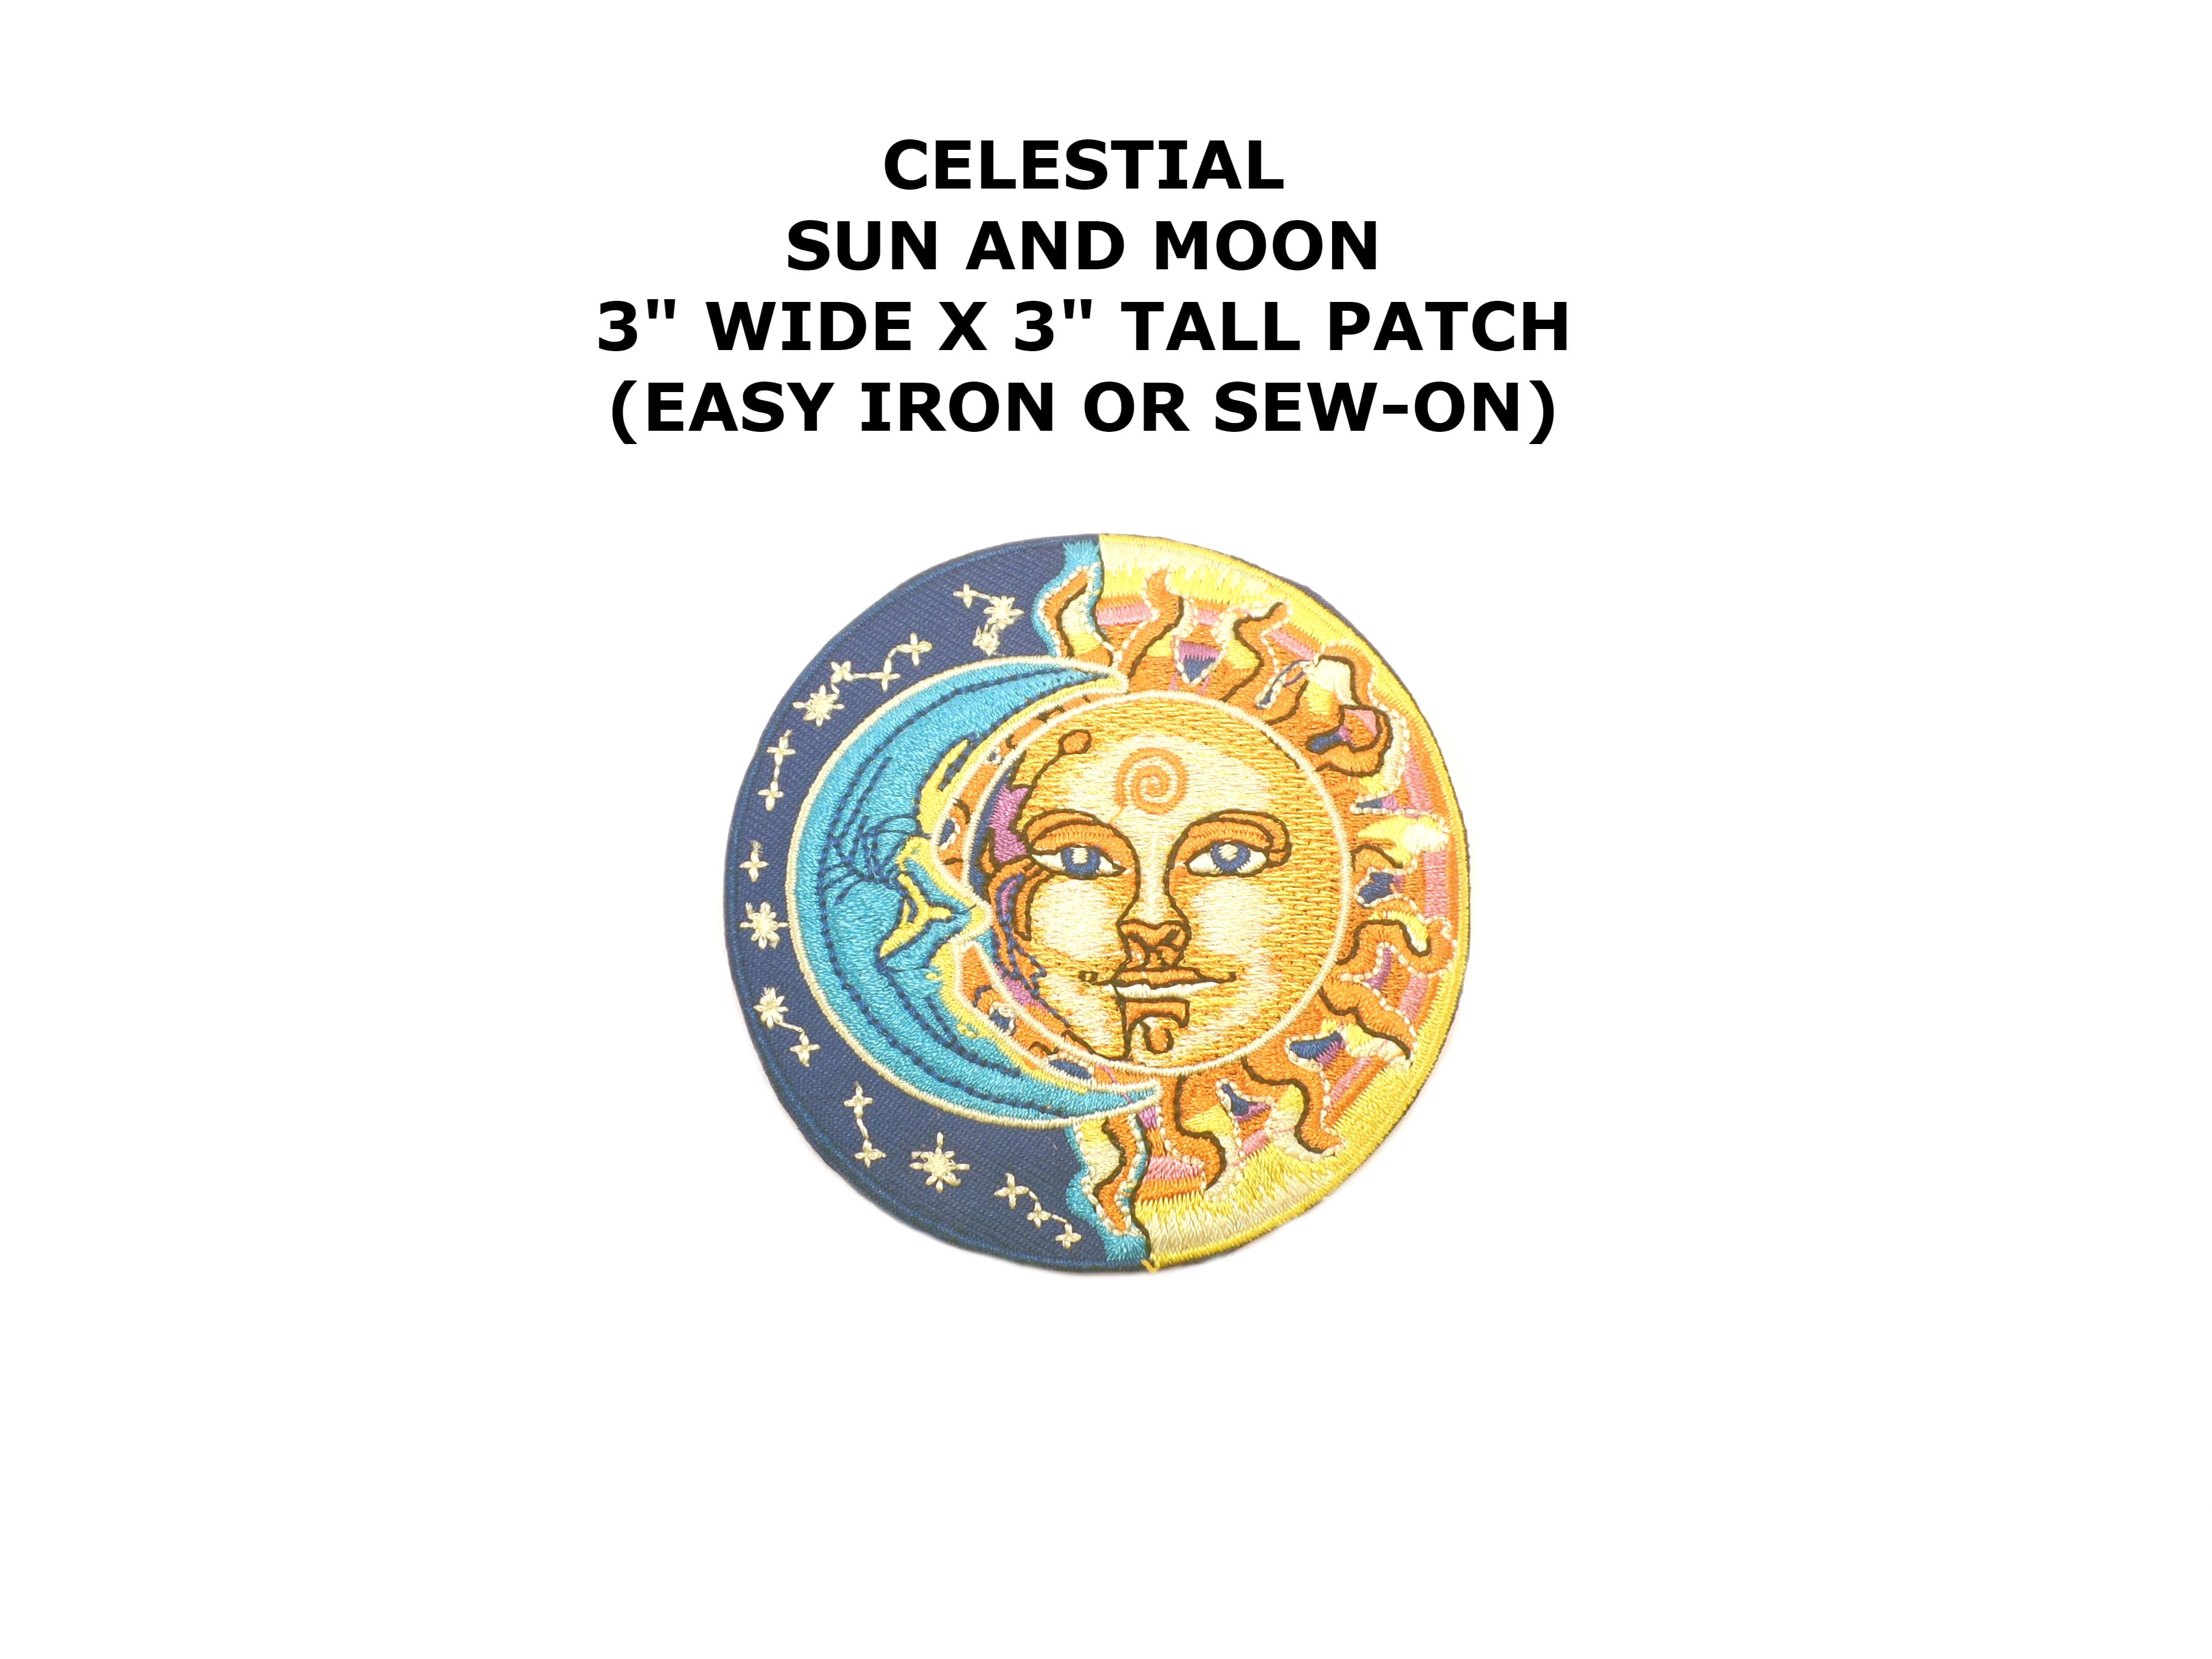 Celestial Half Sun Half Moon Embroidered Iron Sew On Comics Cartoon Theme Logo Patch Applique Walmart Com Walmart Com